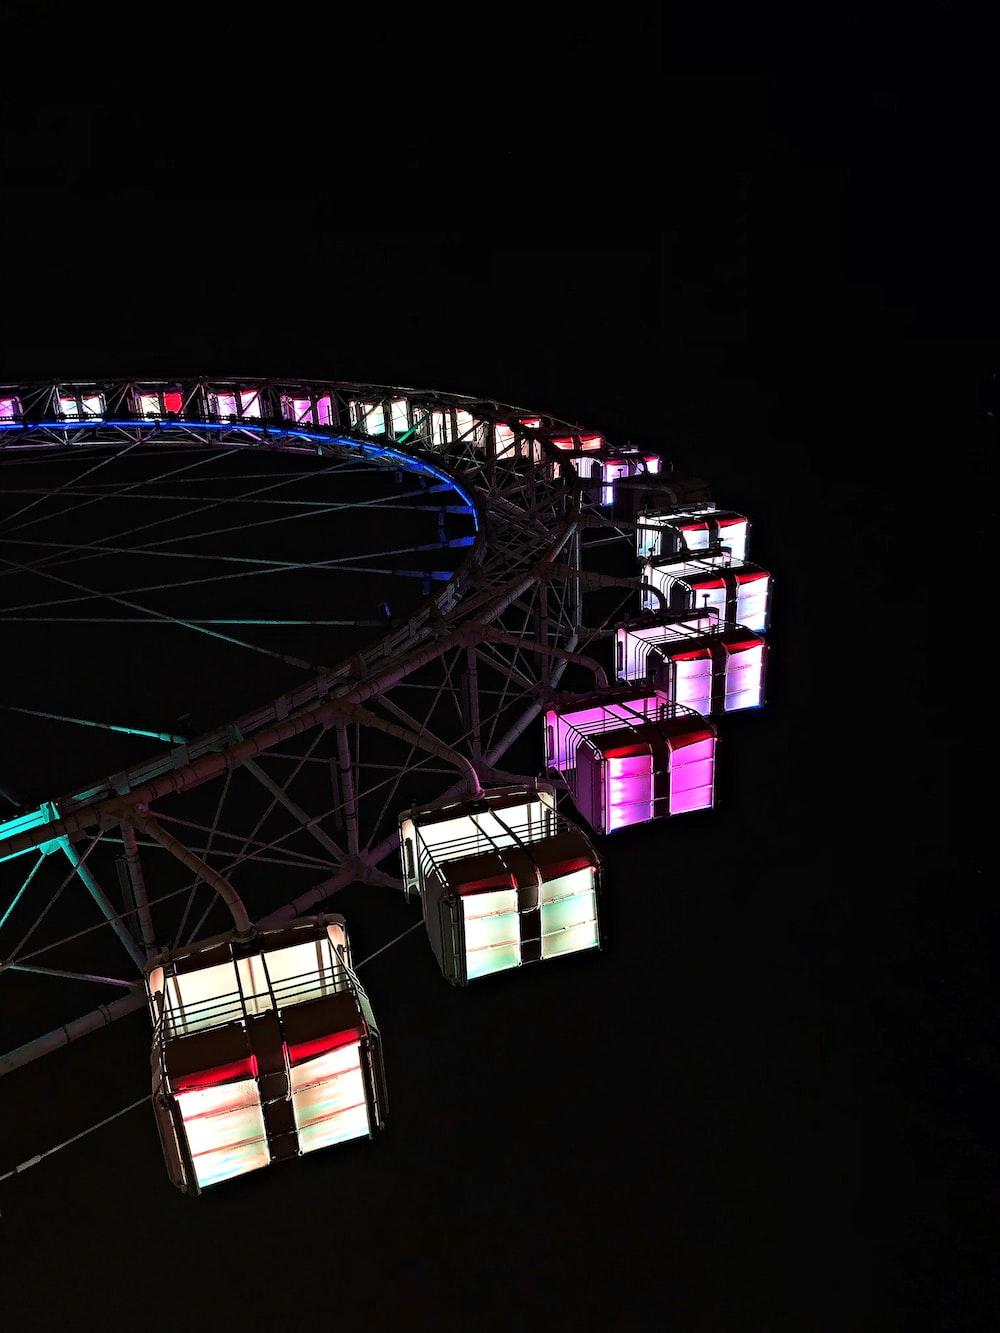 LED Ferris wheel during night